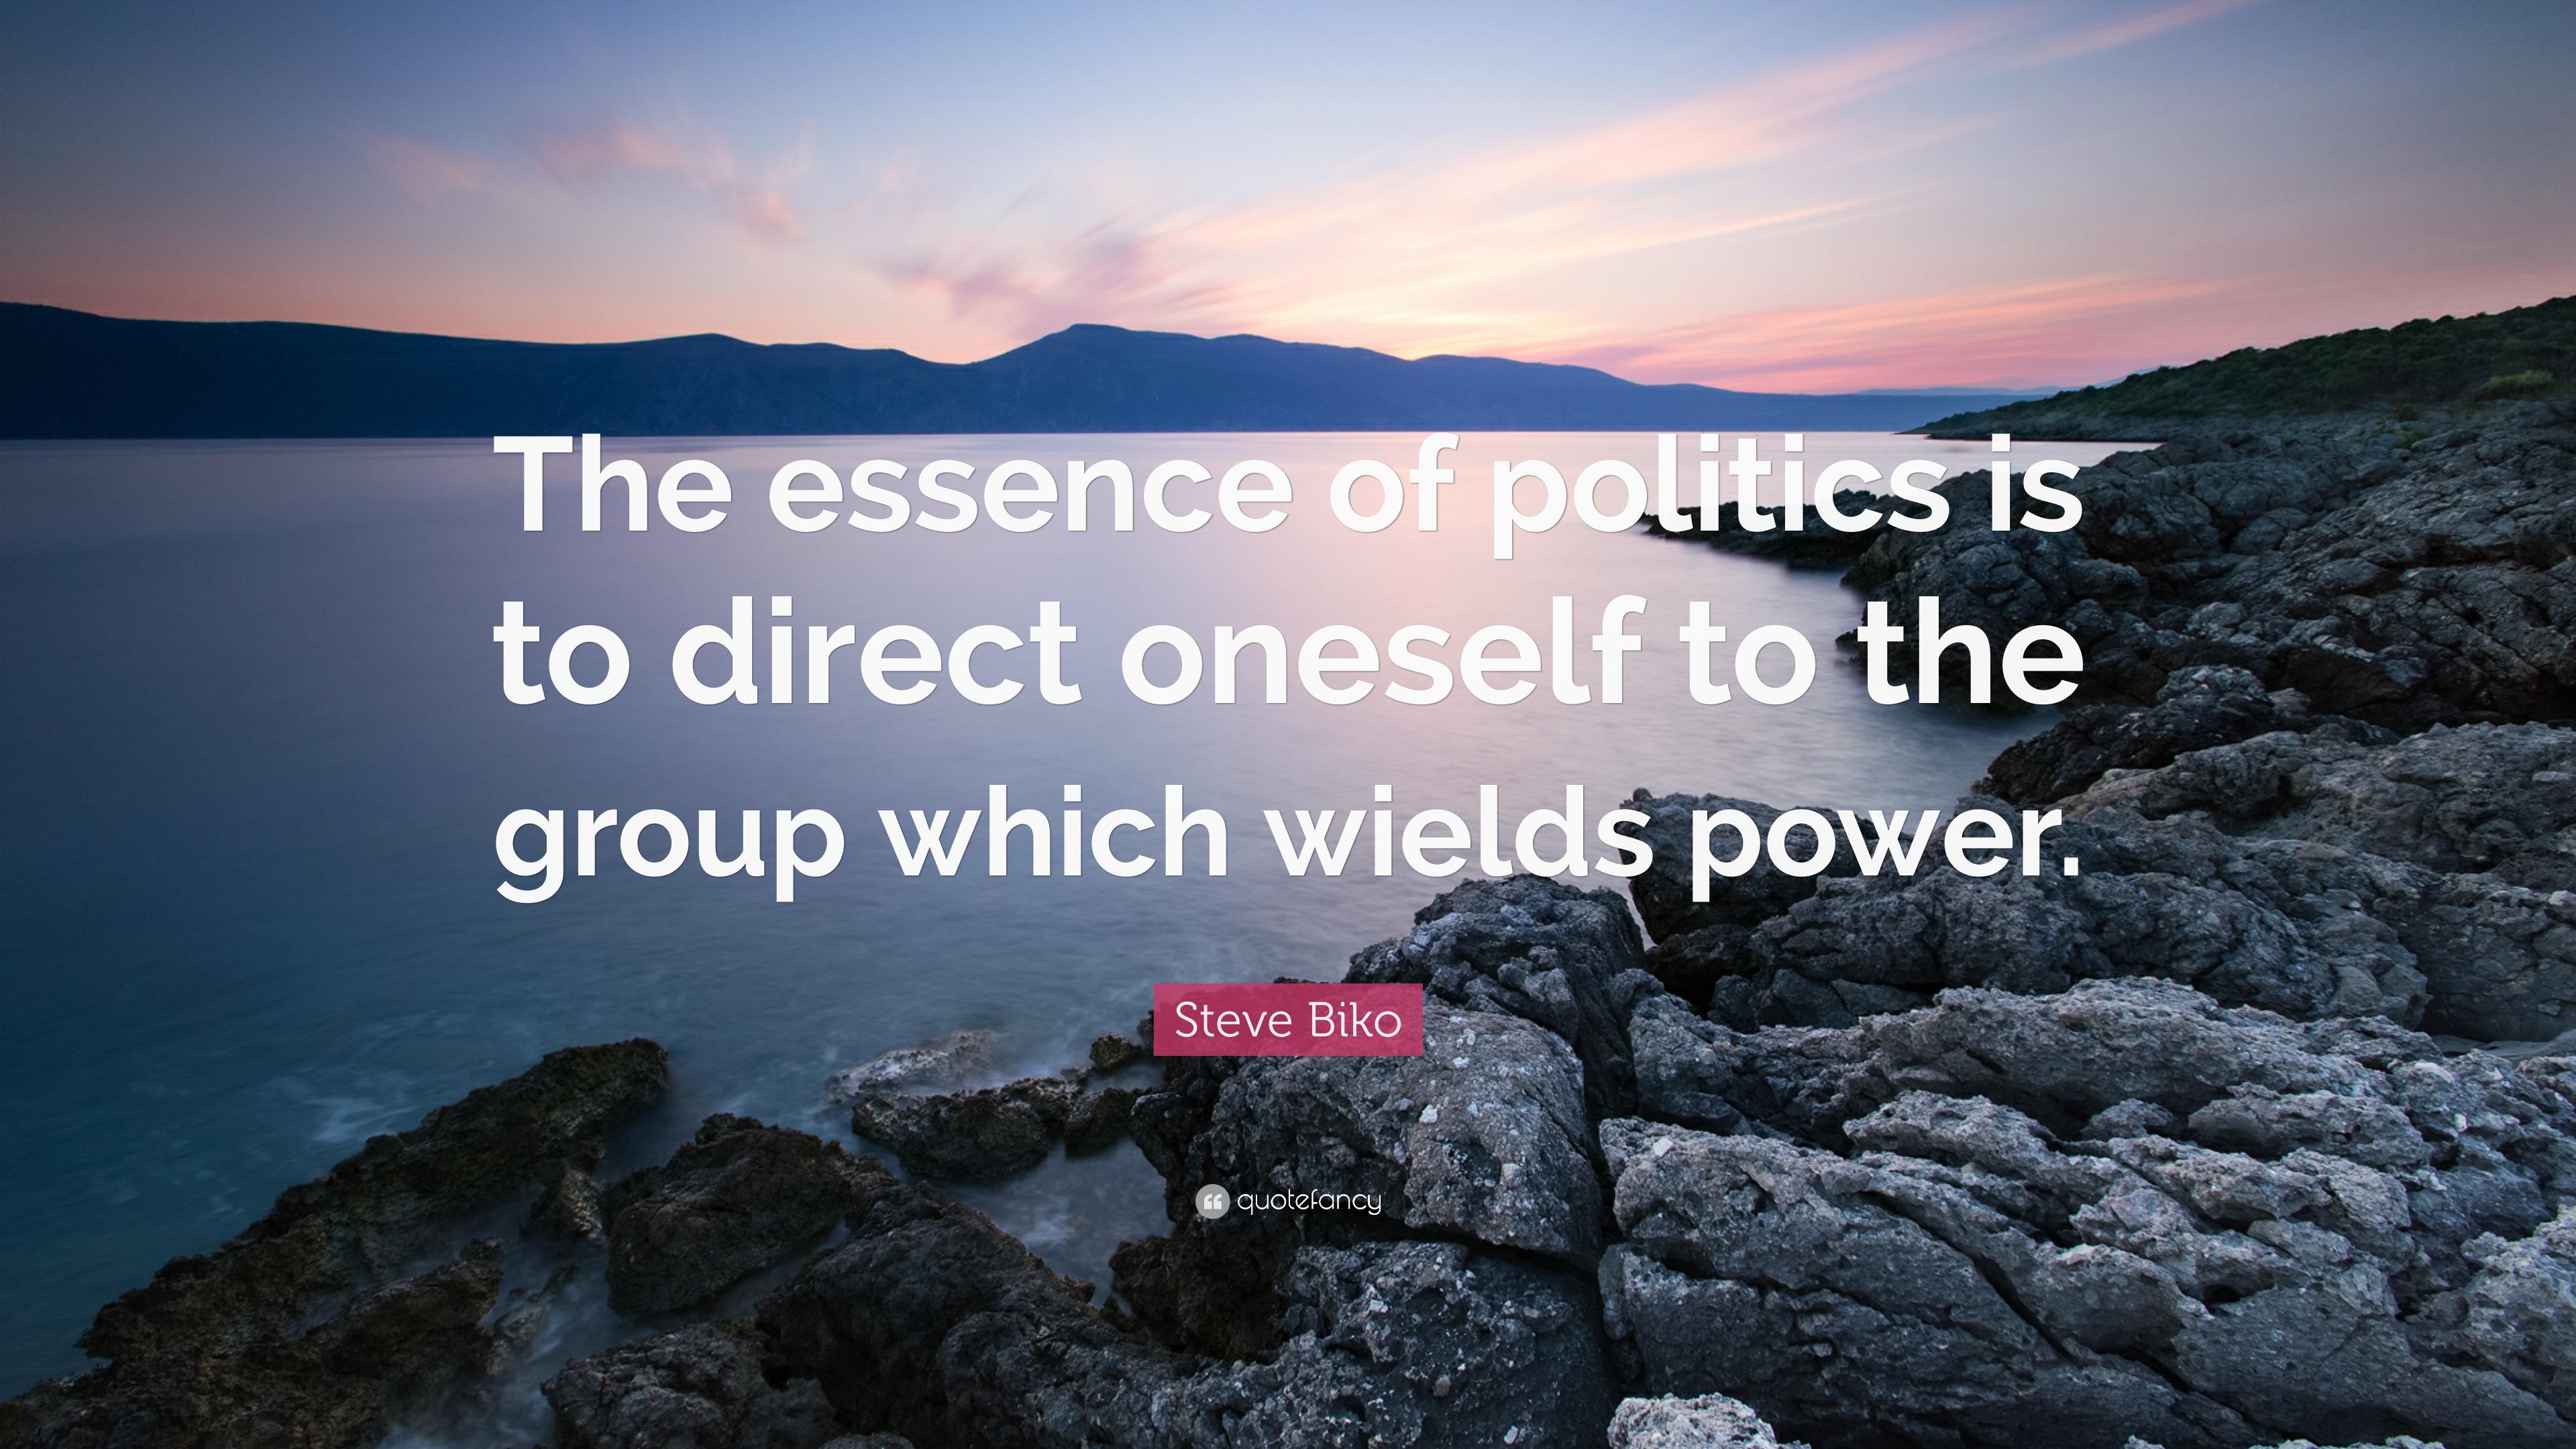 The essence of politics